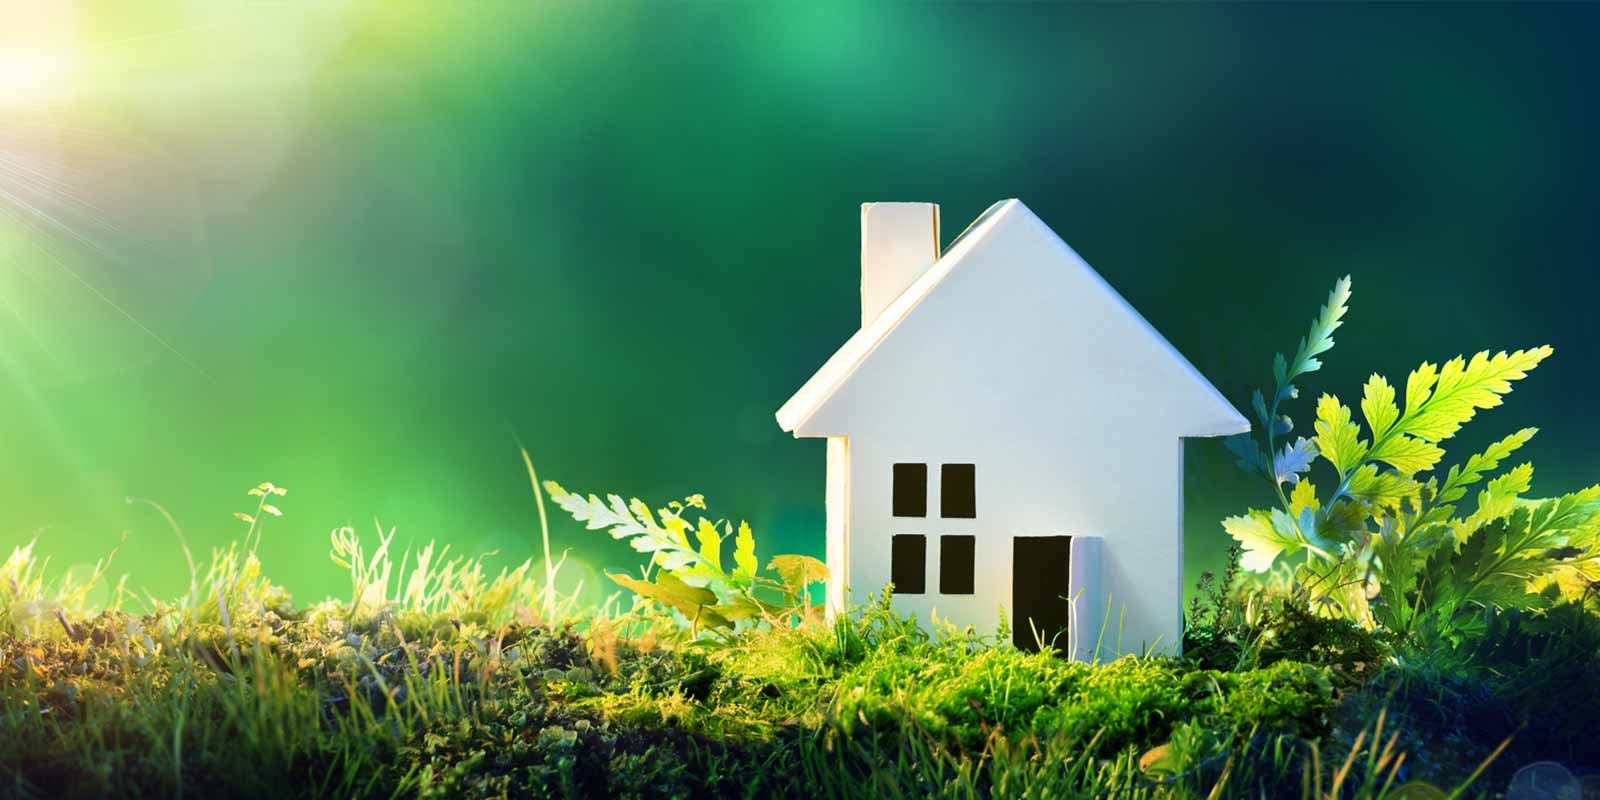 casa certificata ecologica Cantone Ticino